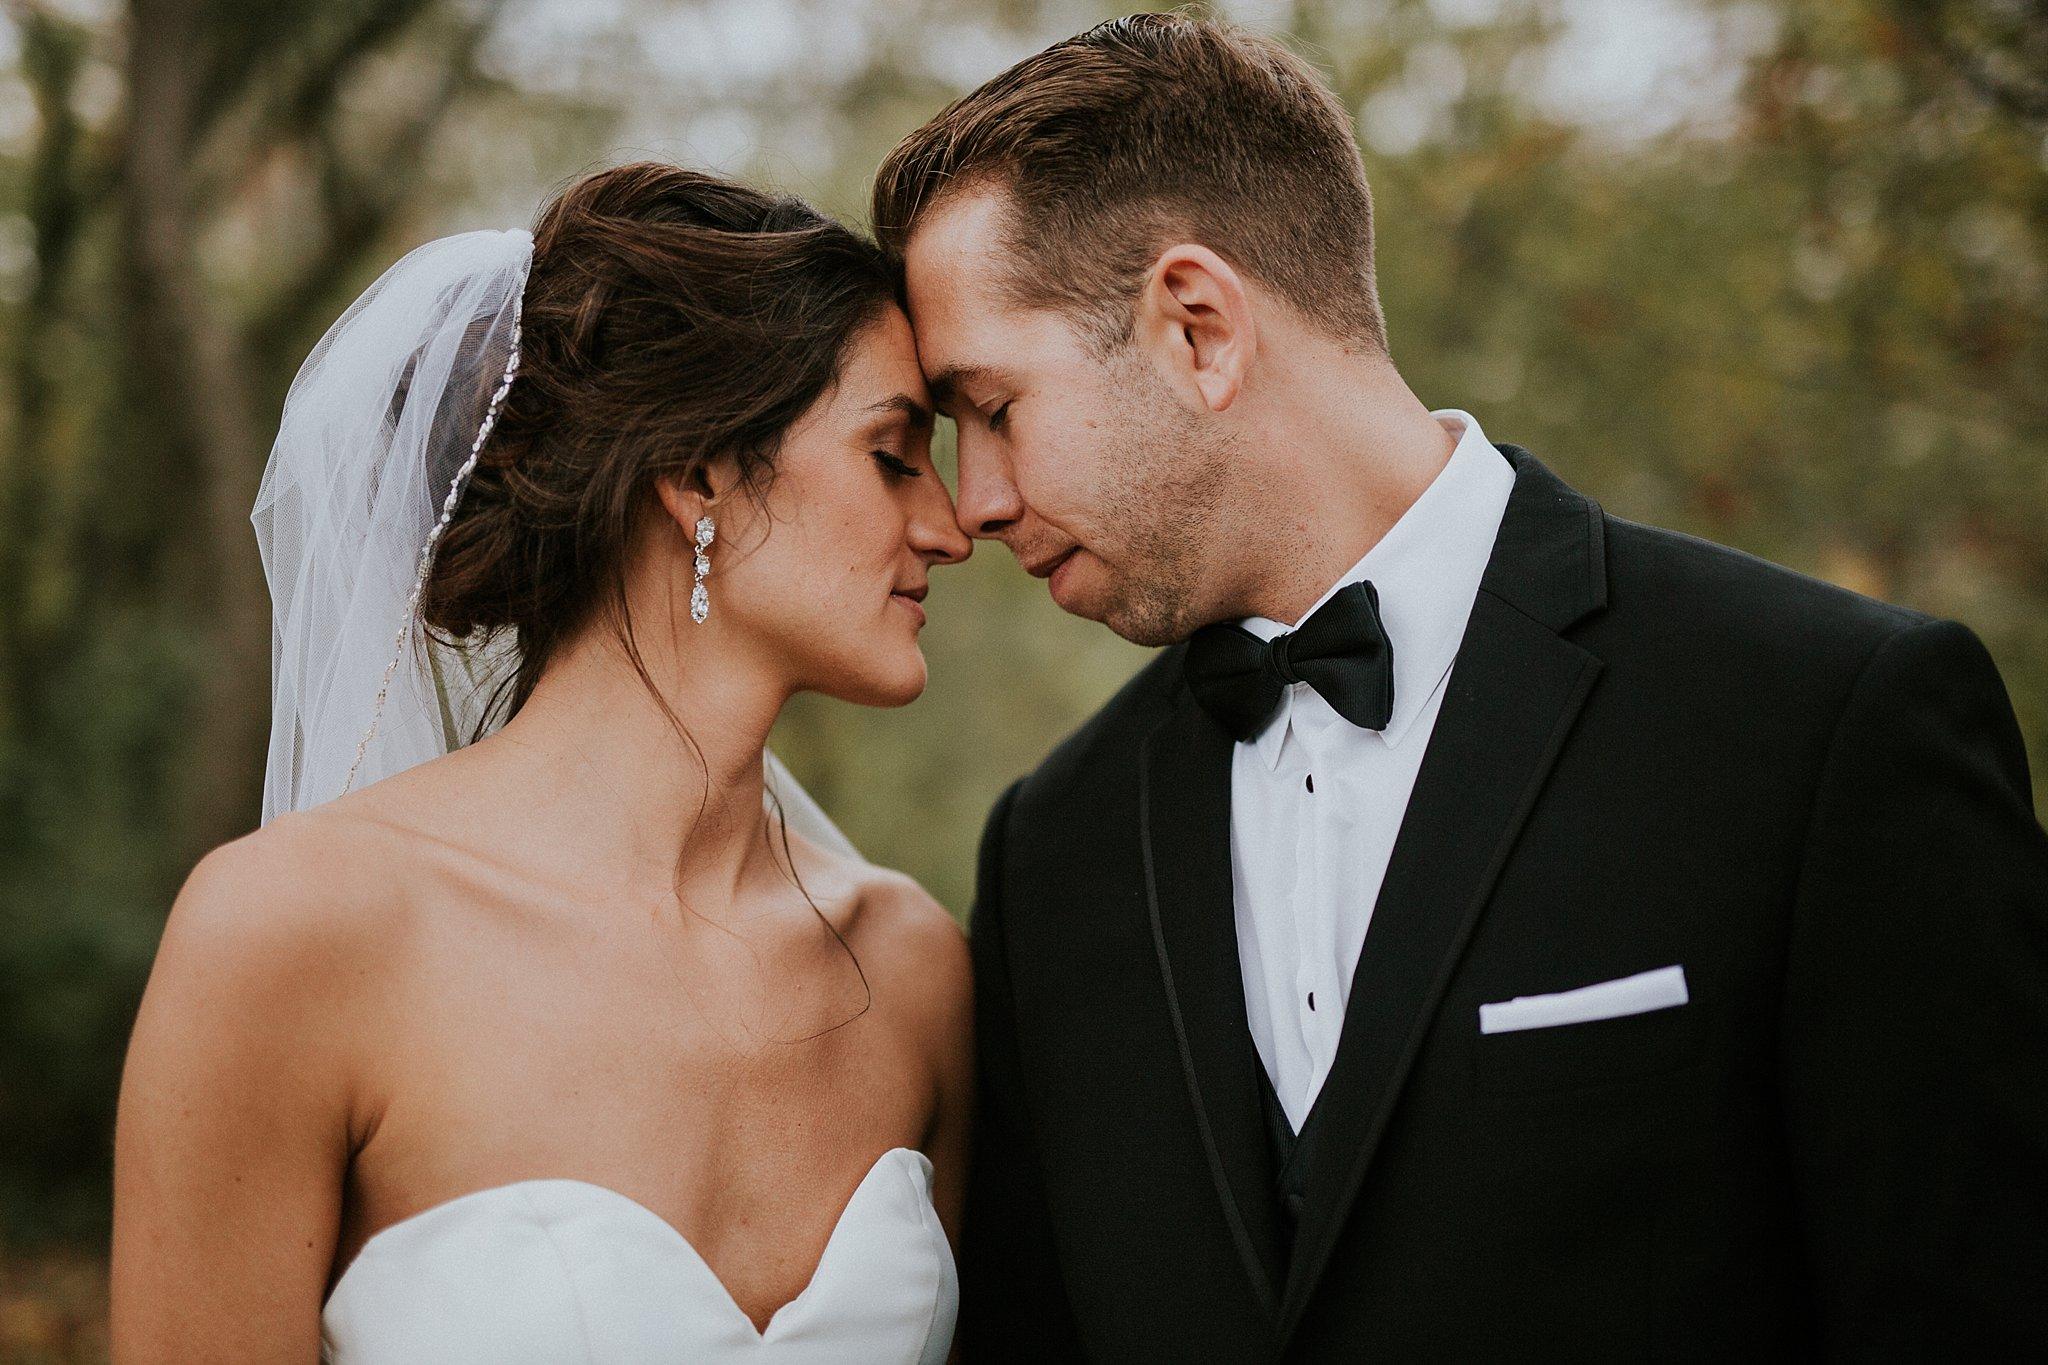 Matt-Lauren_St-Marys_Hilton-City-Center-Milwaukee-Wedding_liller-photo_0044.jpg